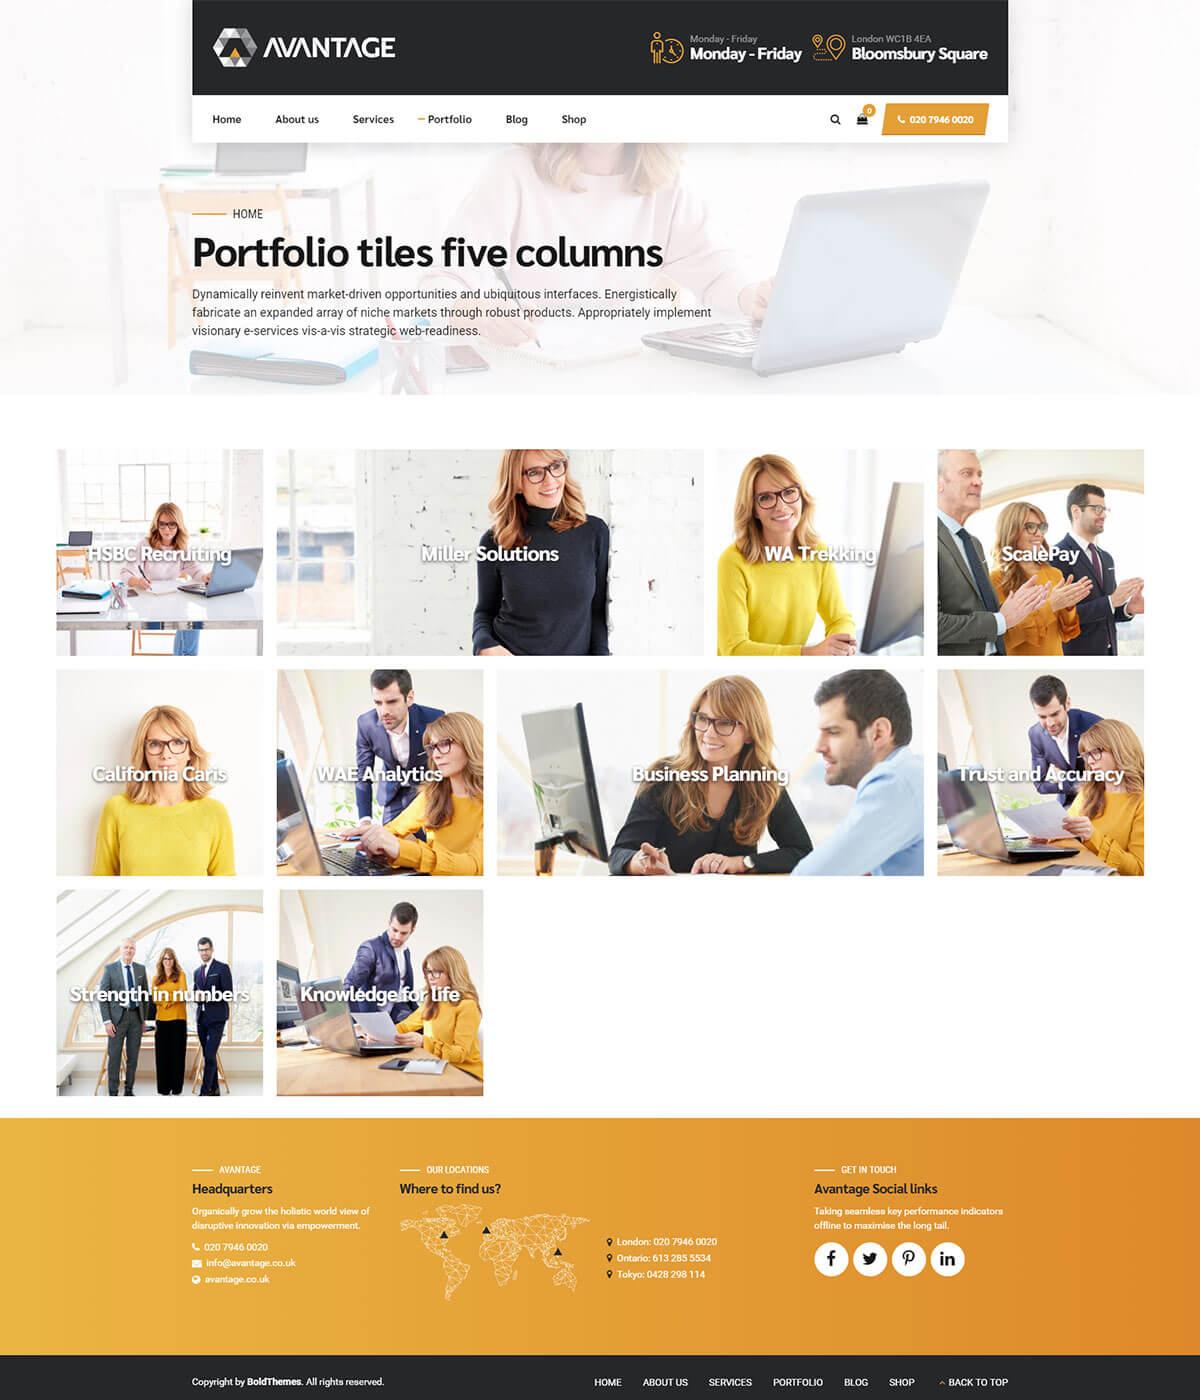 https://avantage.bold-themes.com/wp-content/uploads/2019/05/marketing-12-portfolio.jpg